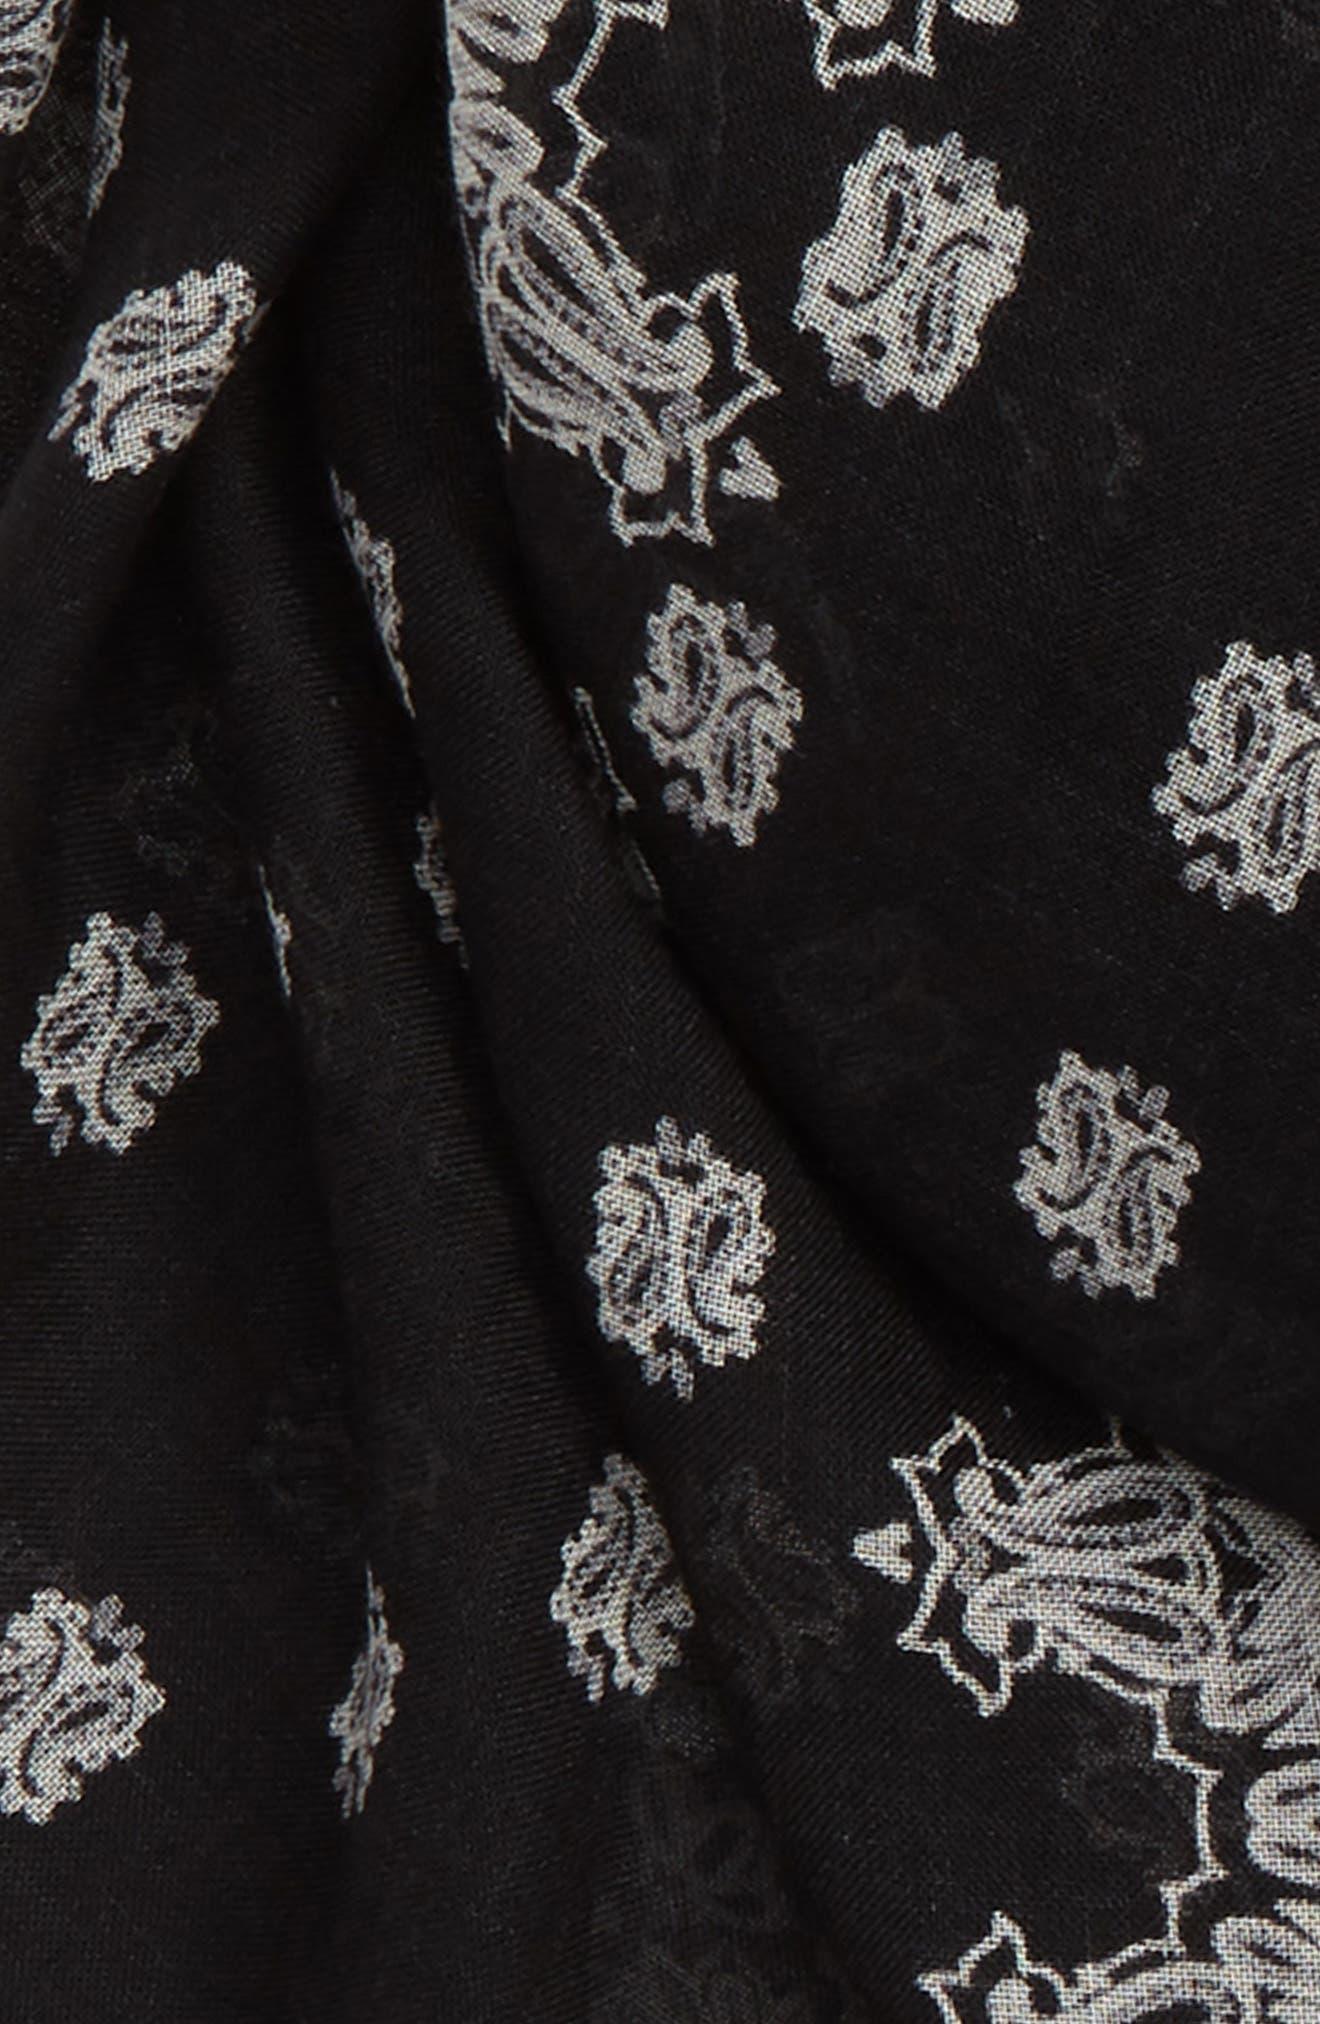 SAINT LAURENT,                             Bandana Print Cashmere & Silk Scarf,                             Alternate thumbnail 3, color,                             001